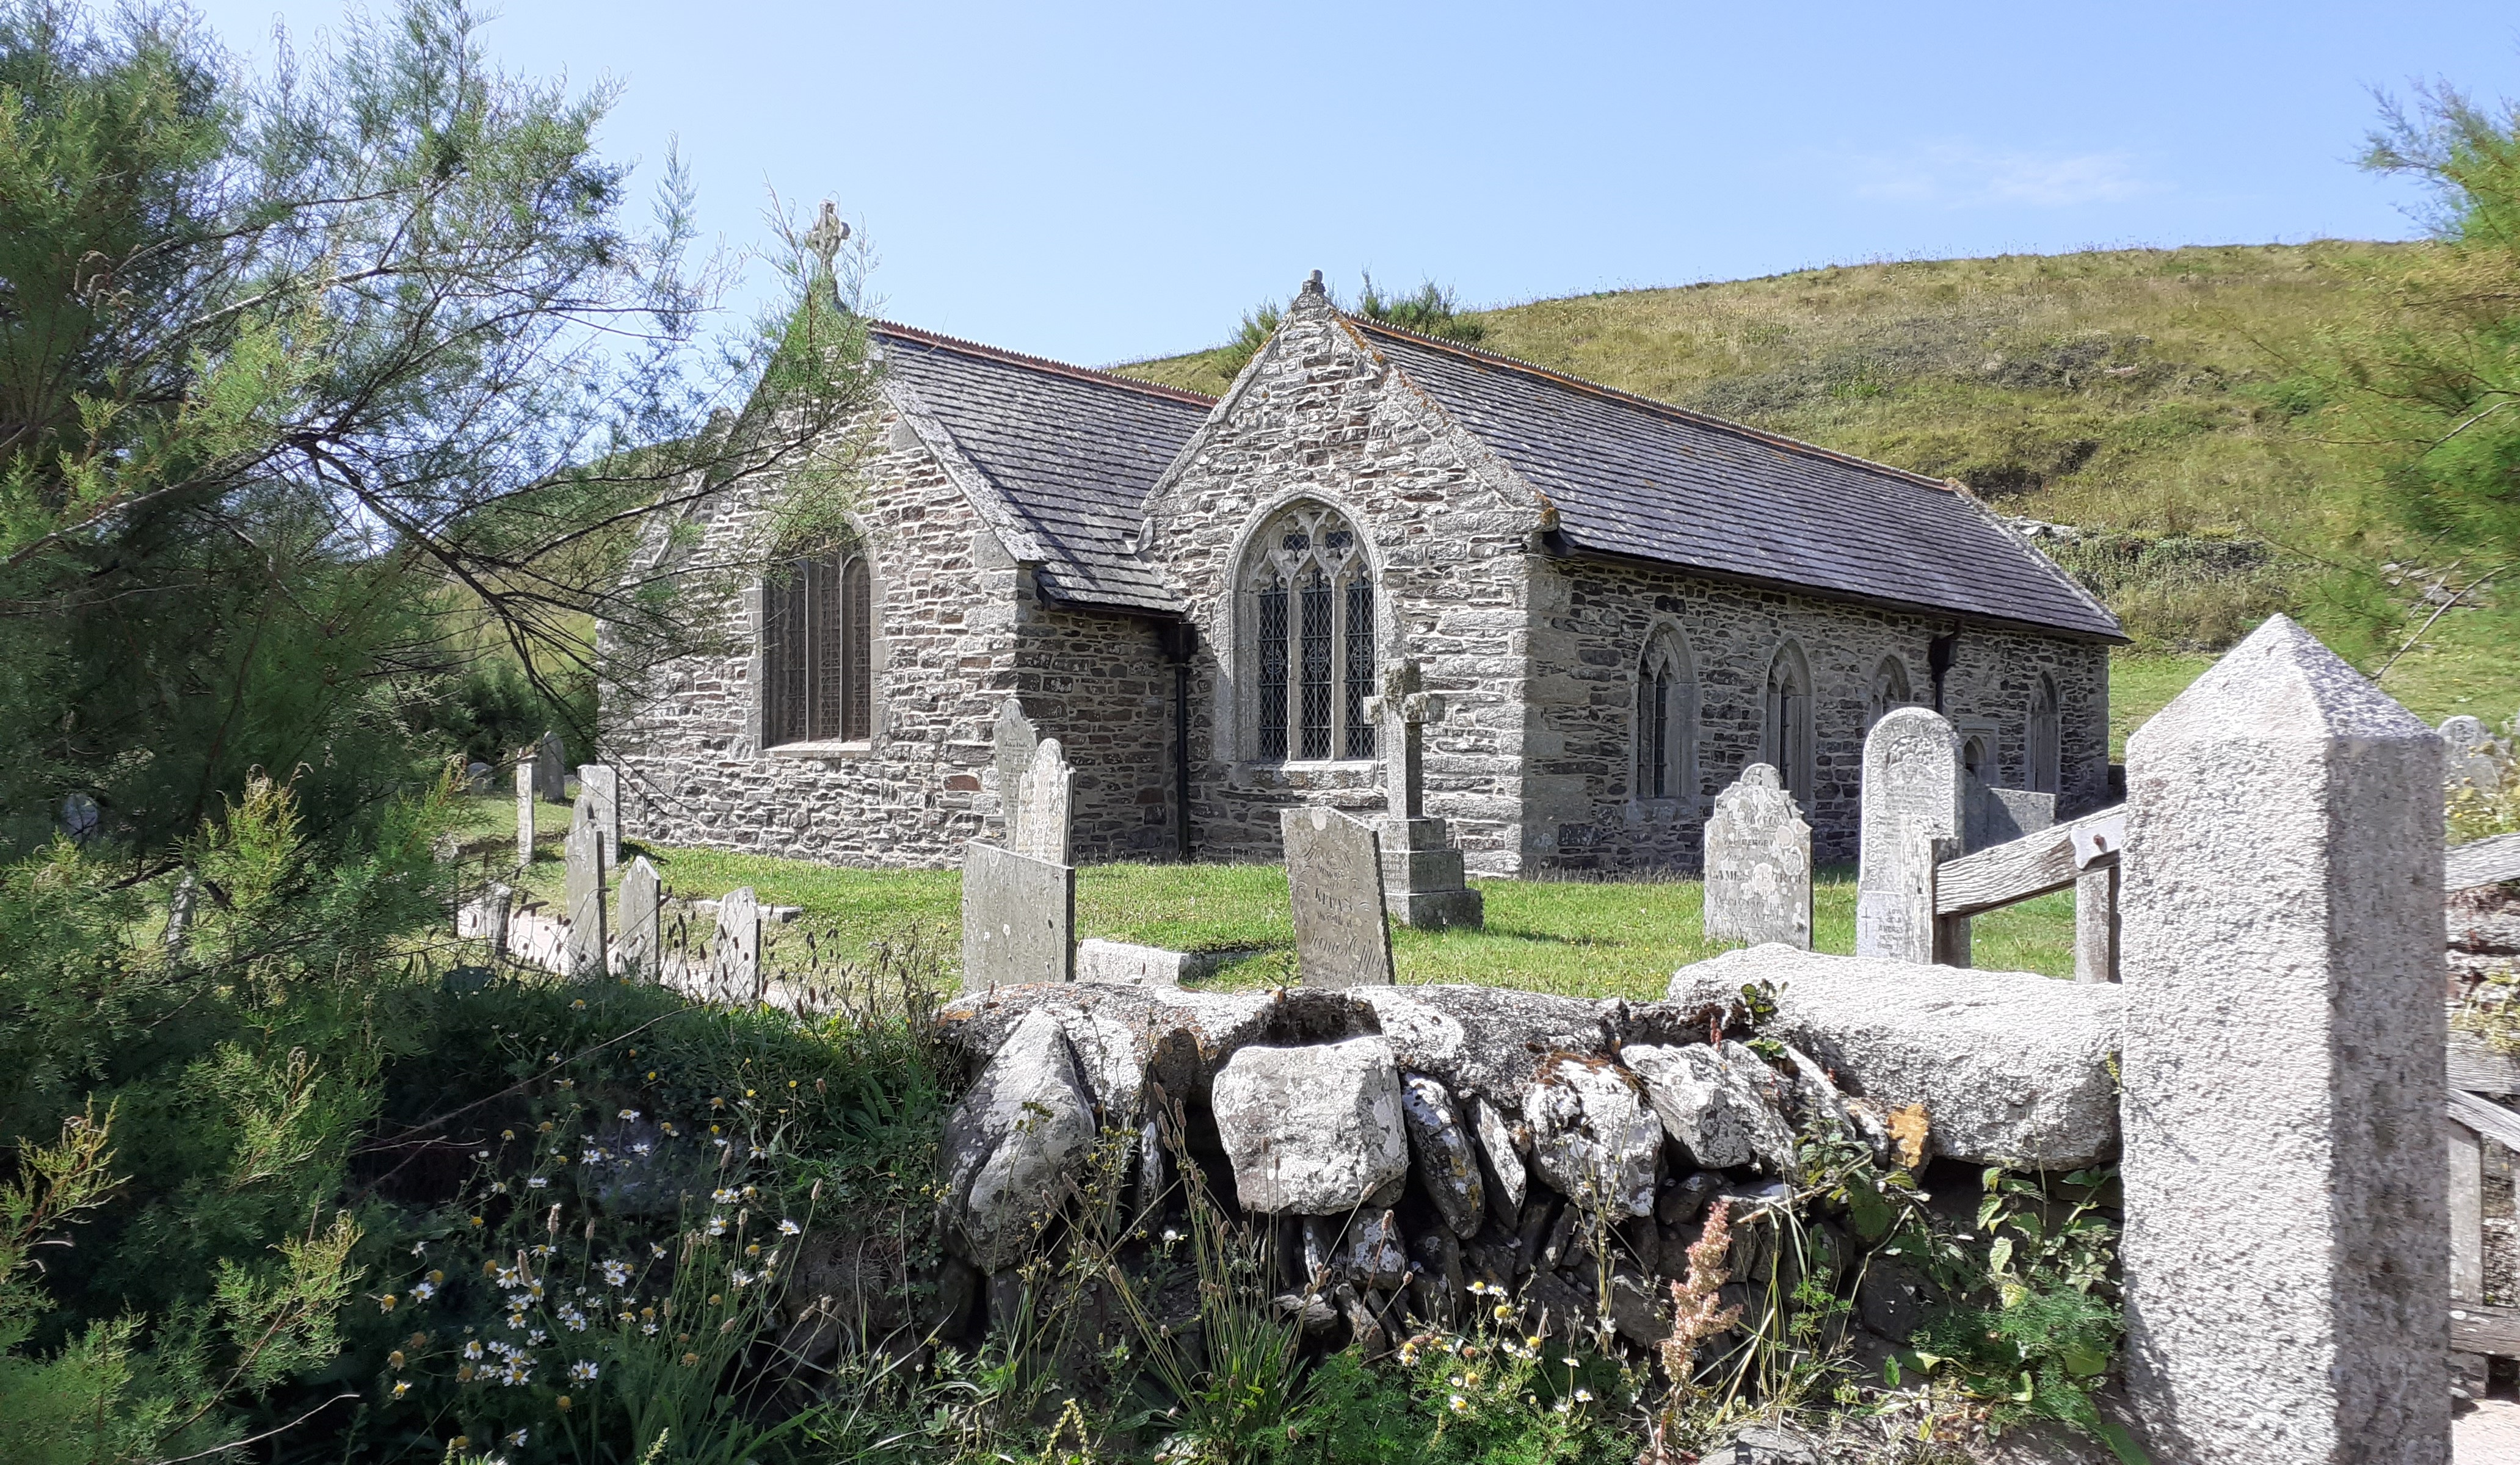 St Winwaloe church, Gunwalloe, Cornwall